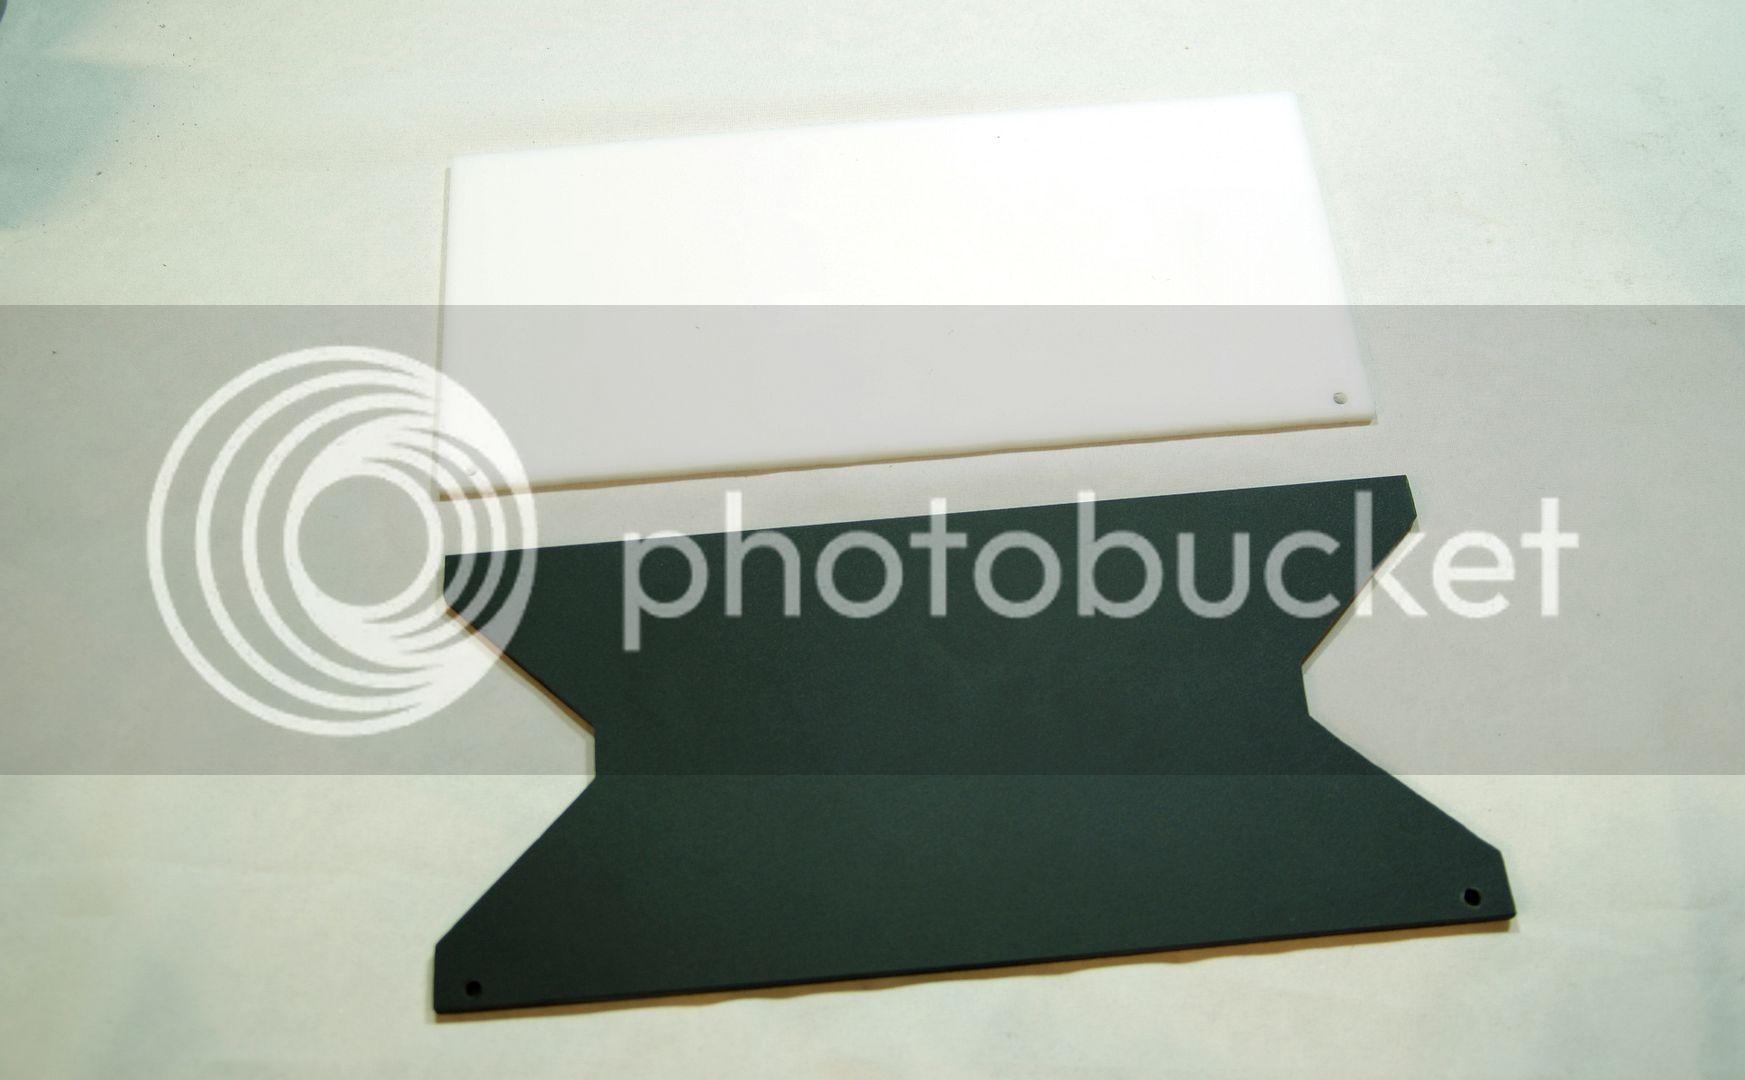 http://i759.photobucket.com/albums/xx233/kier1976/NEW/Parvum/P4/DSC00426.jpg